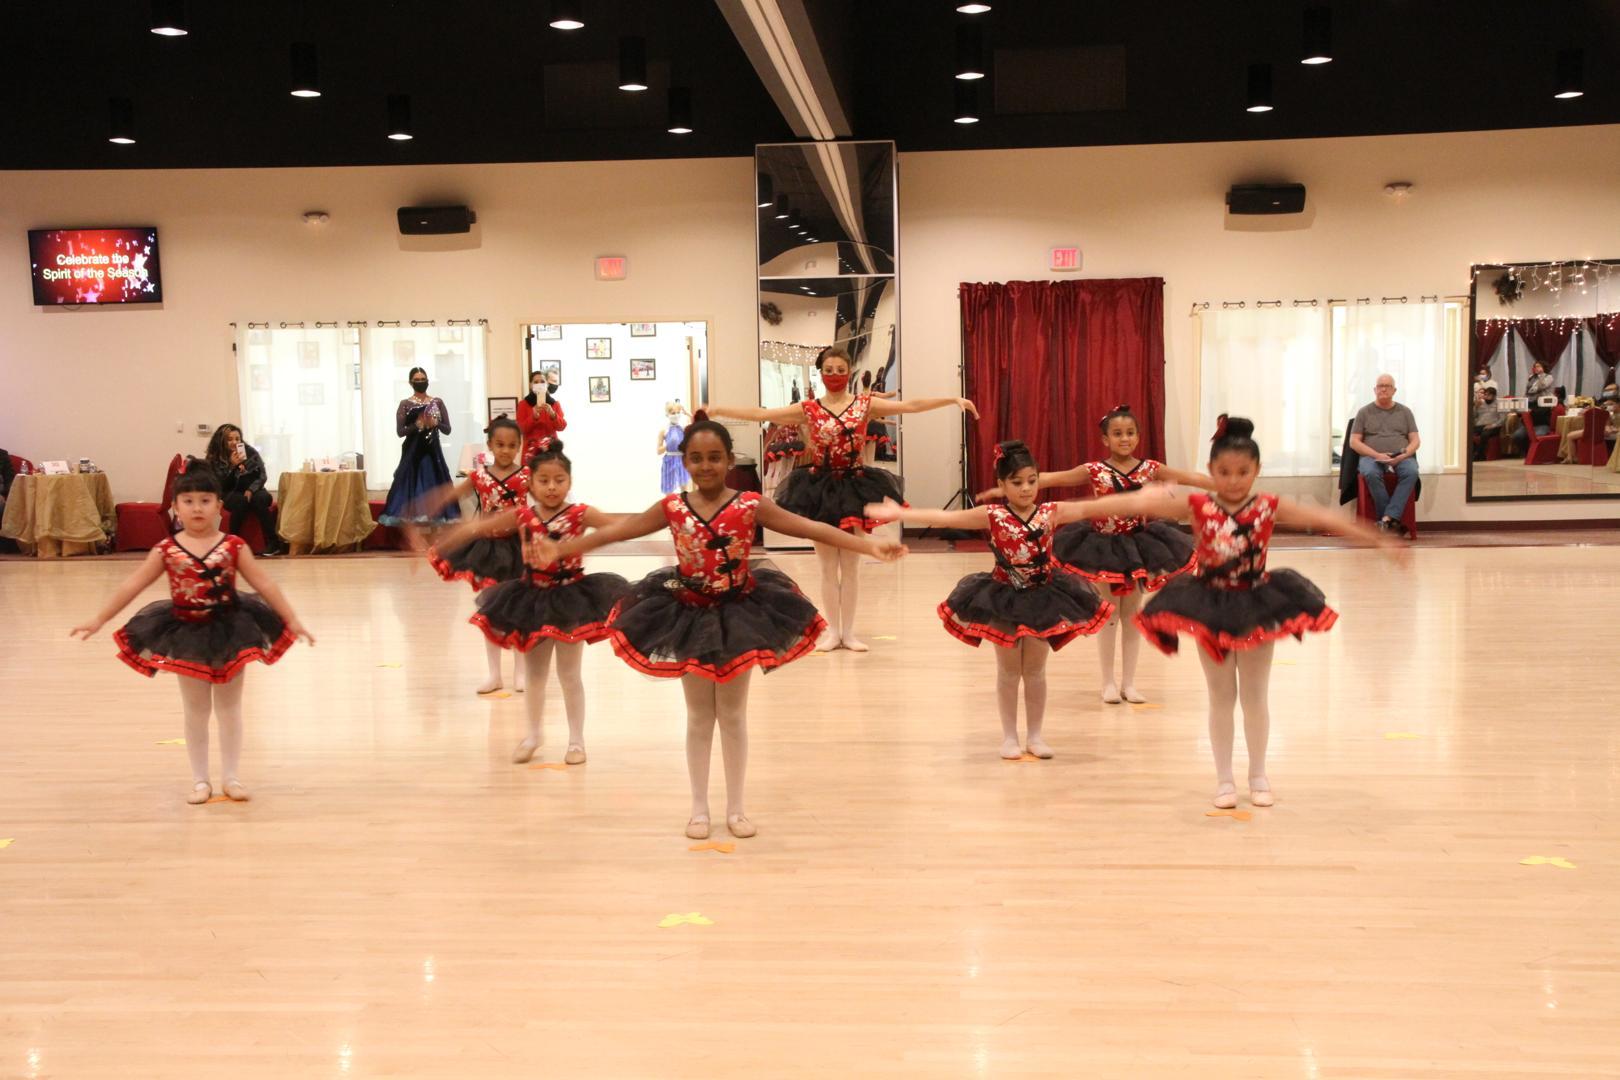 Children Ballet performance at Holiday Dance Showcase